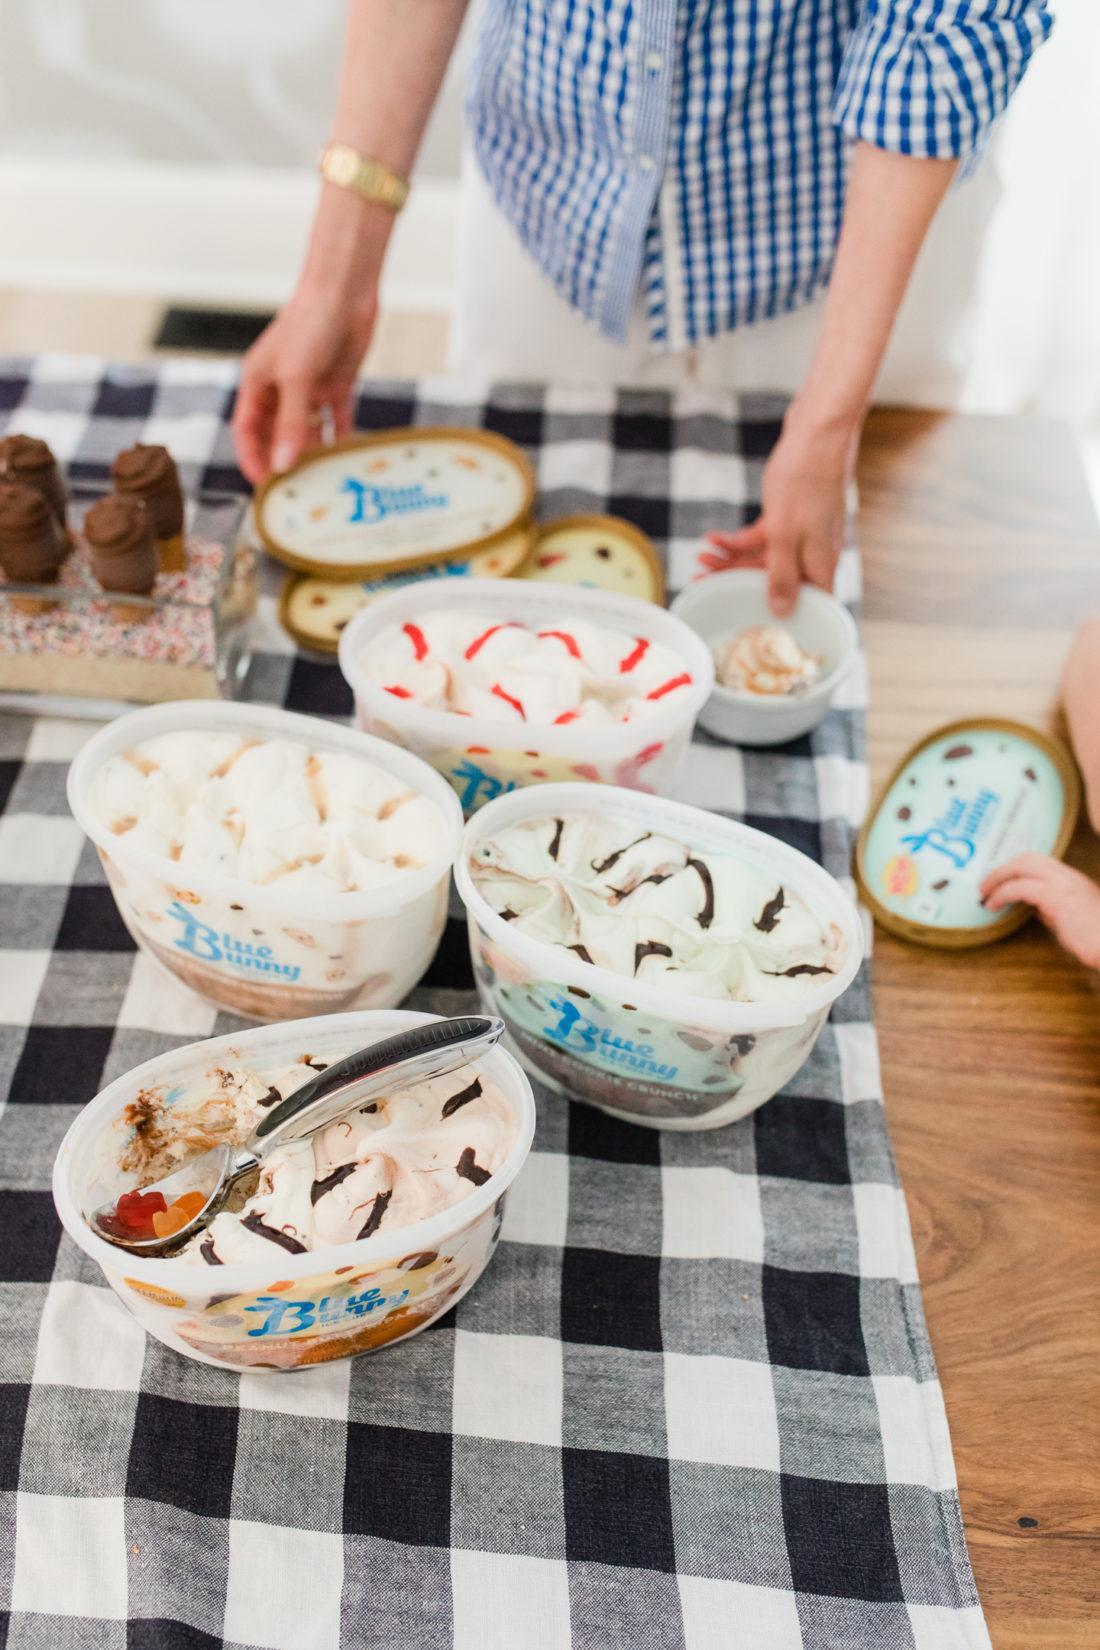 Eva Amurri Martino throws a family friendly ice cream social at her Connecticut home with Blue Bunny ice cream